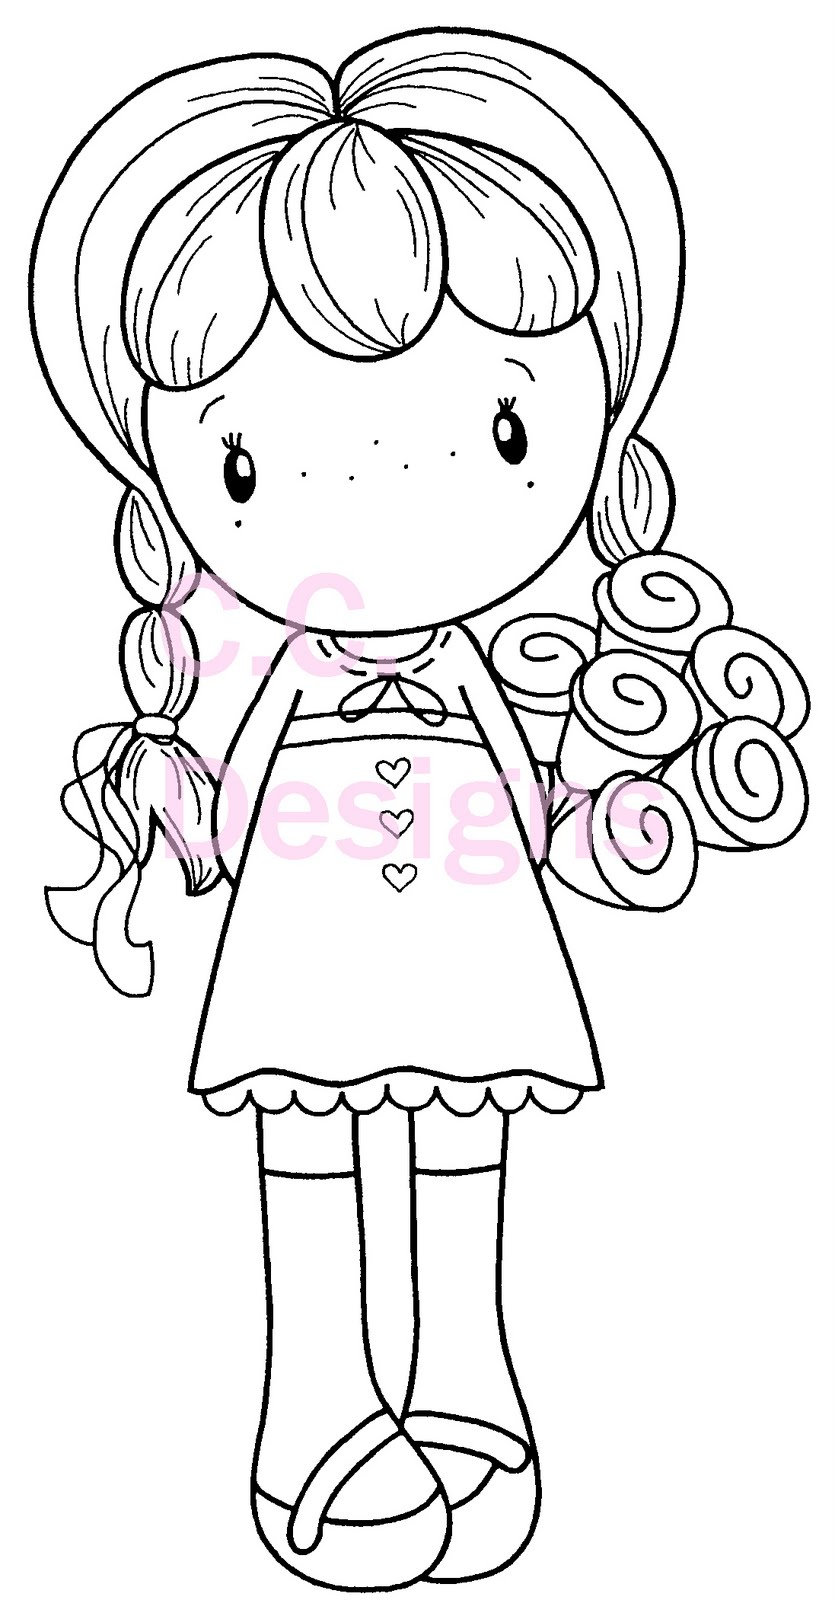 Pictures of Marker Coloring Page - kidskunst.info